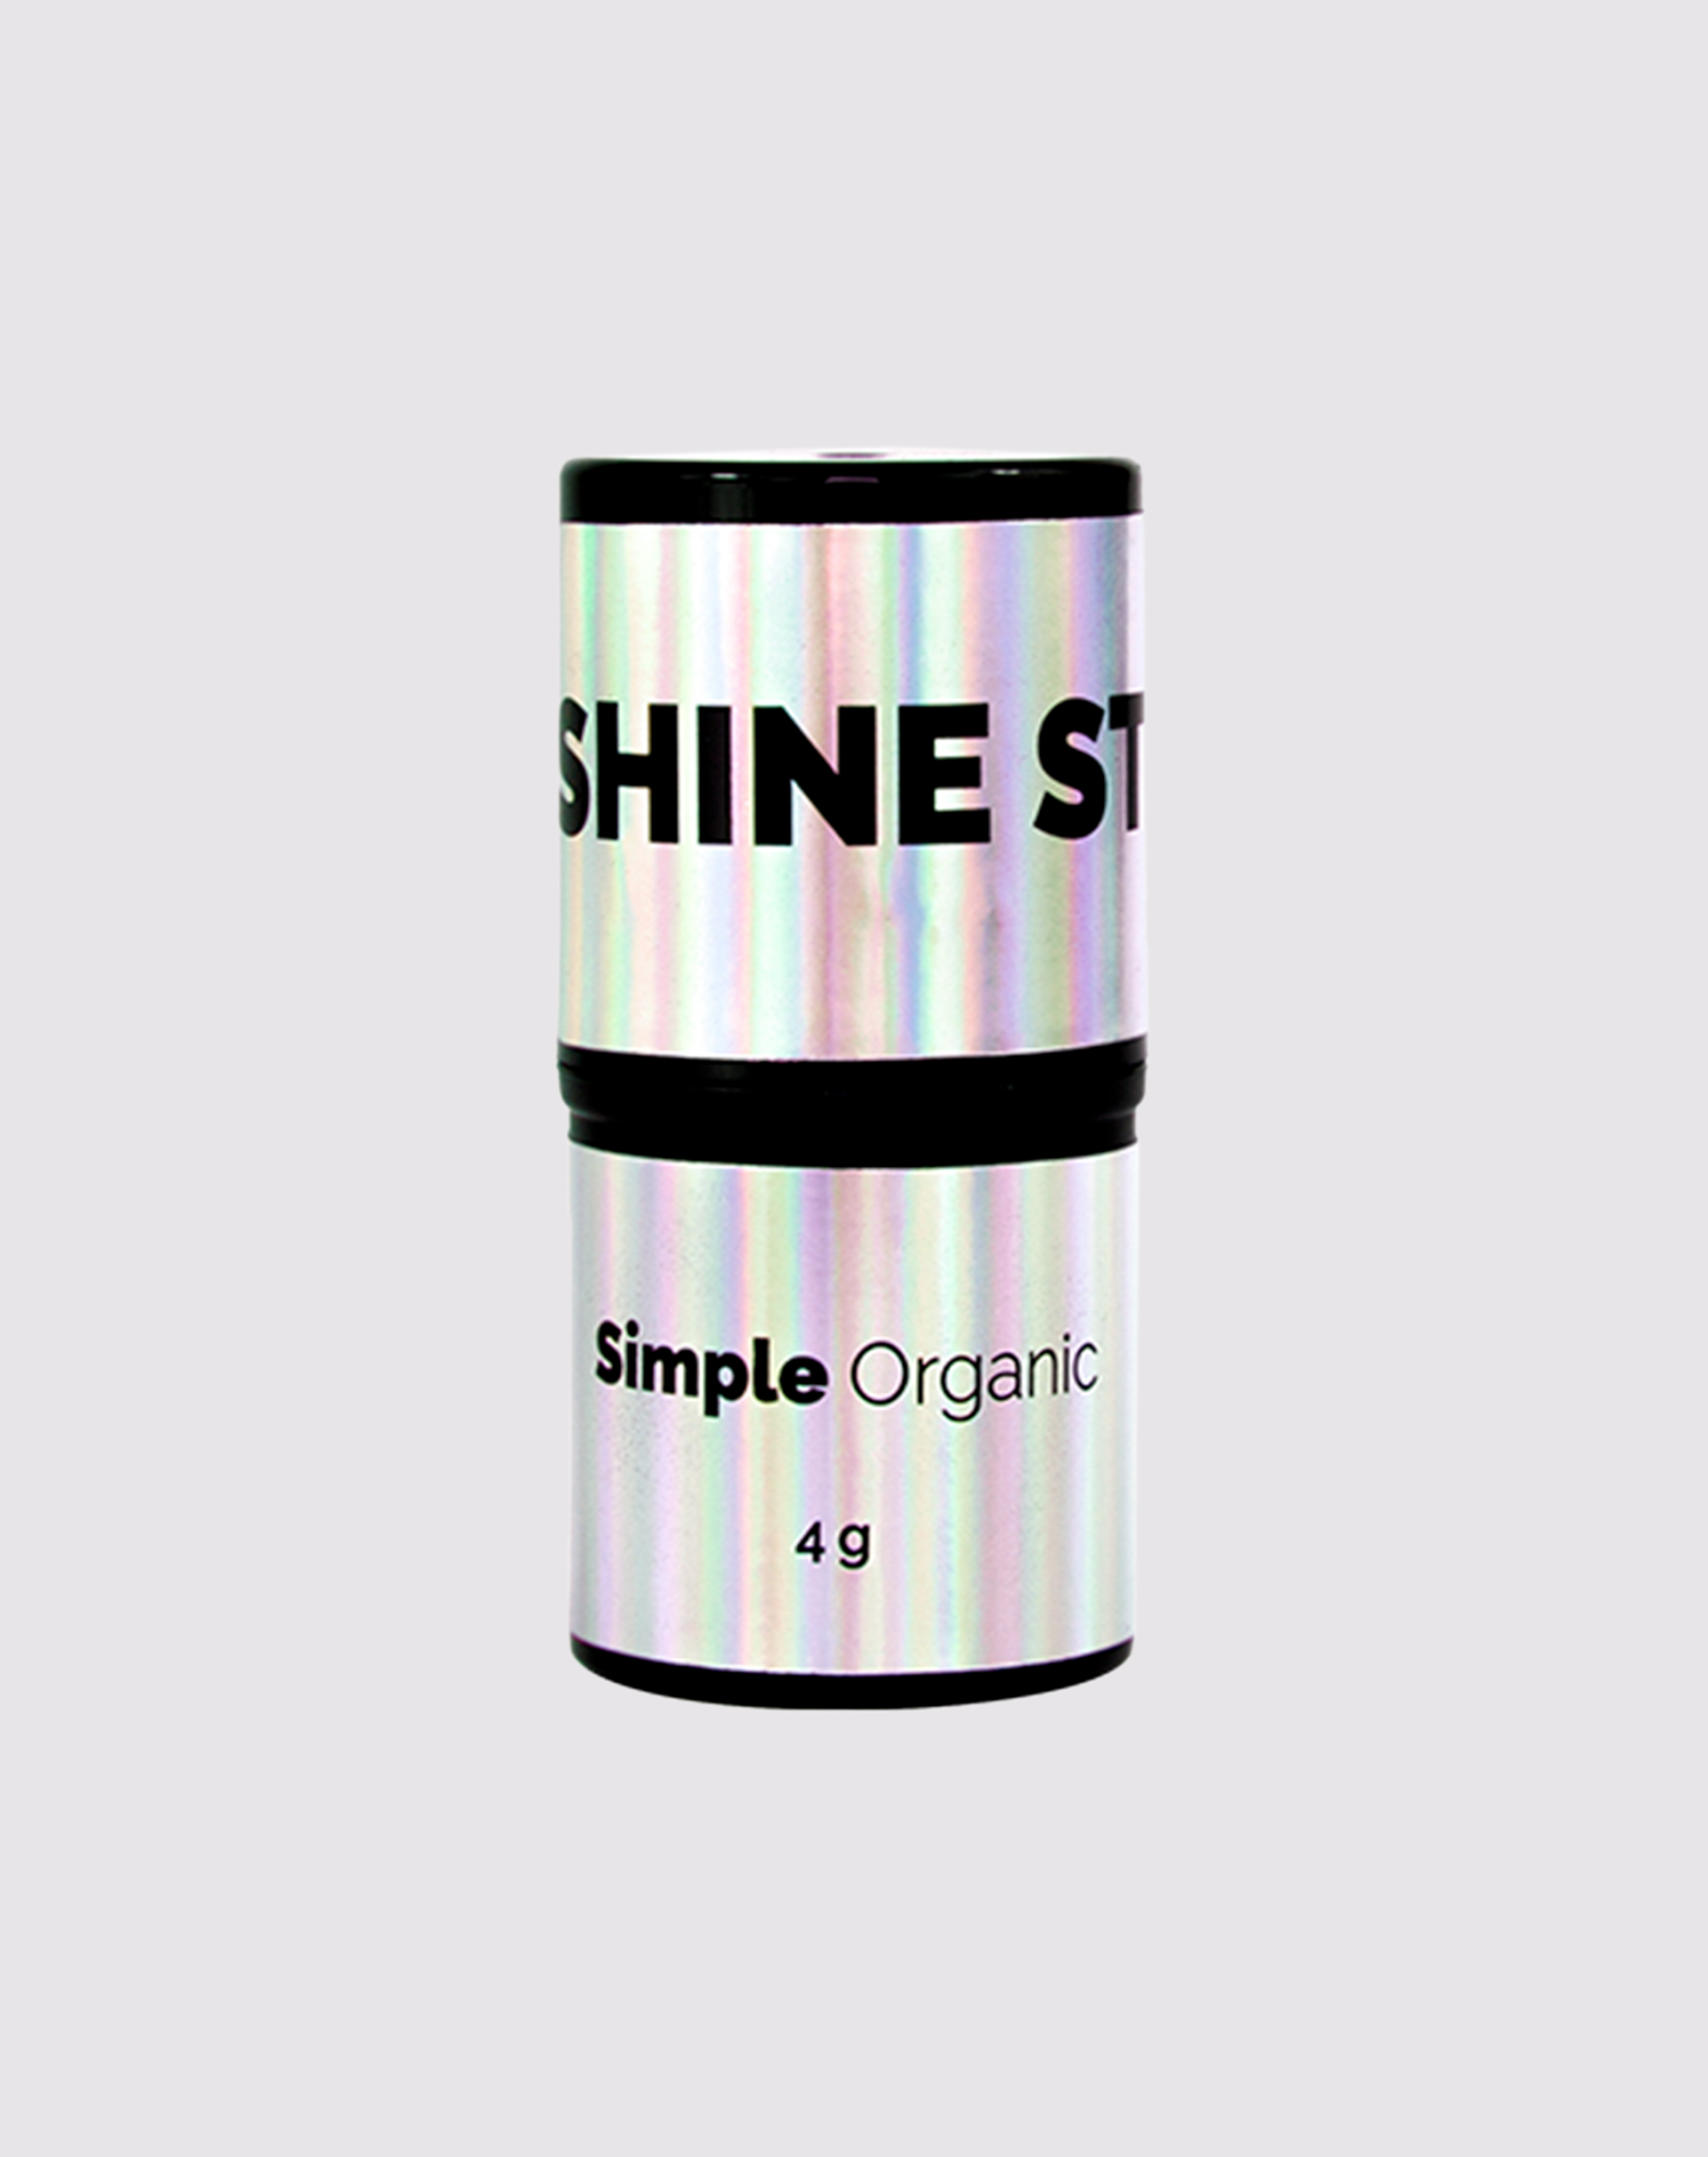 SIMPLE ORGANIC SHINE STICK